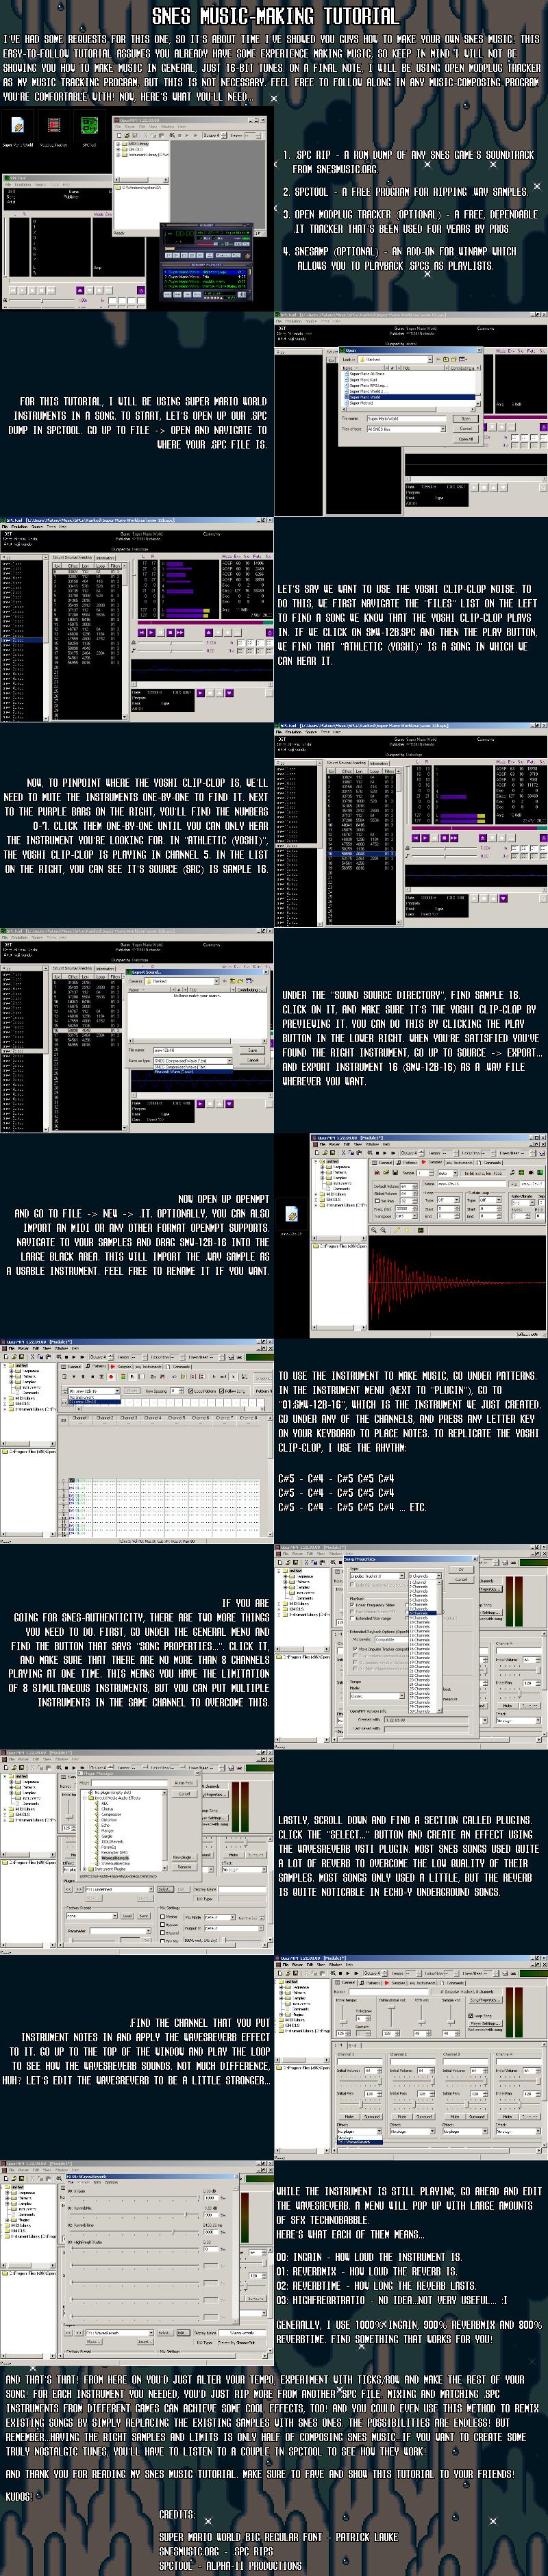 SNES Music-Making Tutorial by DragonDePlatino on DeviantArt